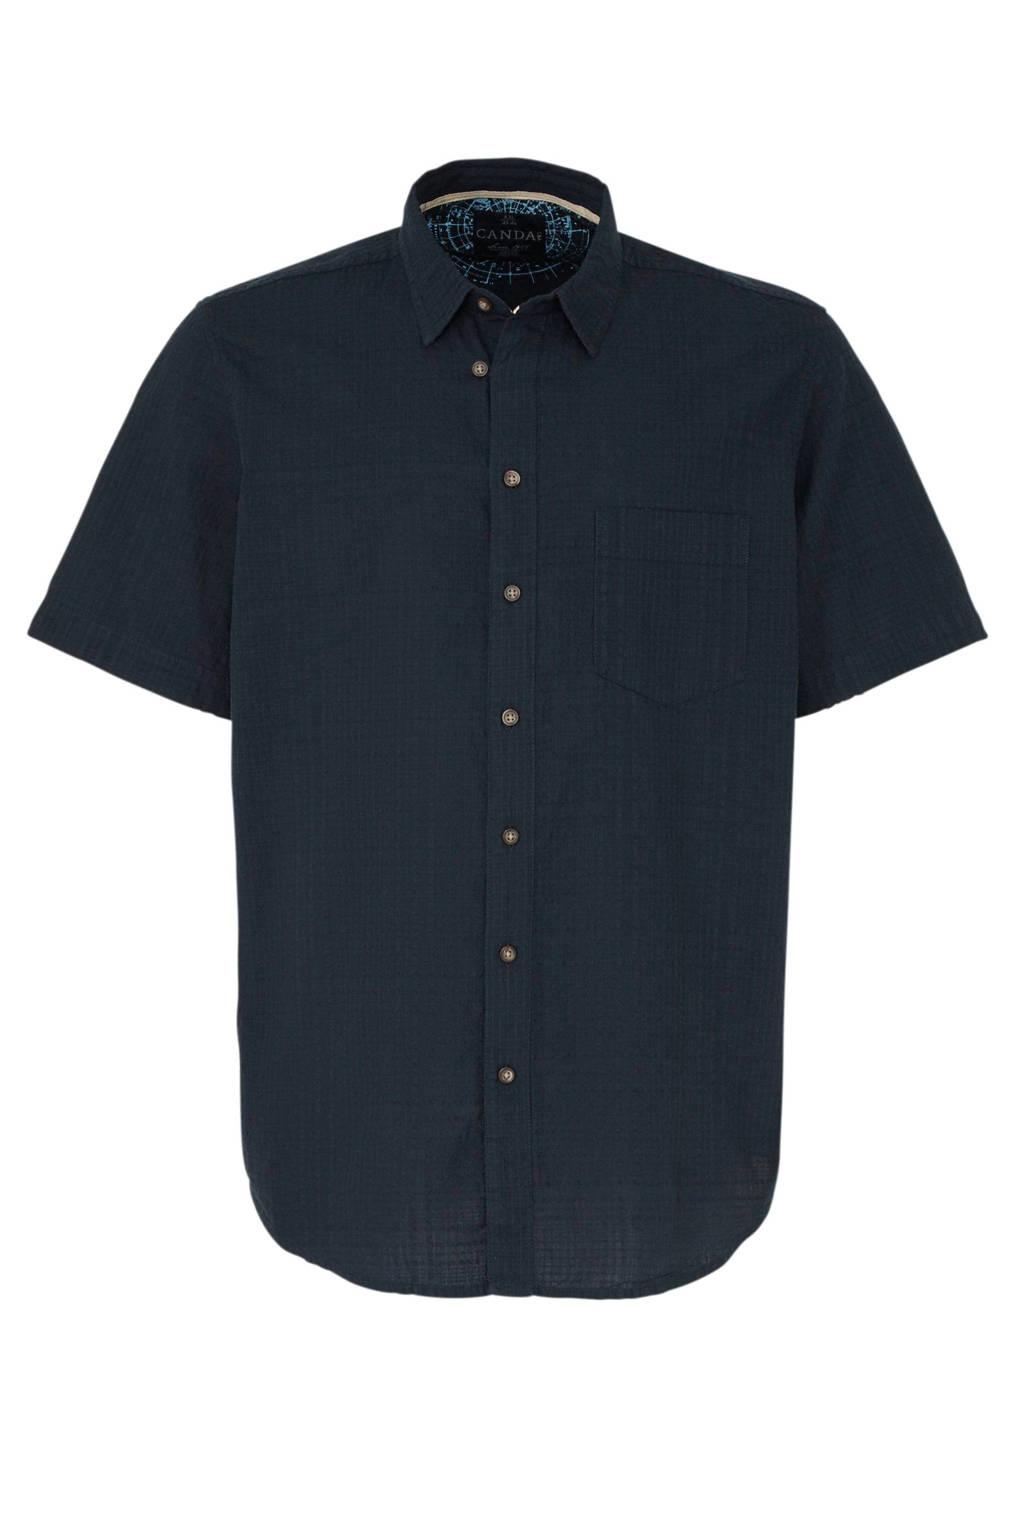 C&A XL Canda overhemd donkerblauw, Donkerblauw